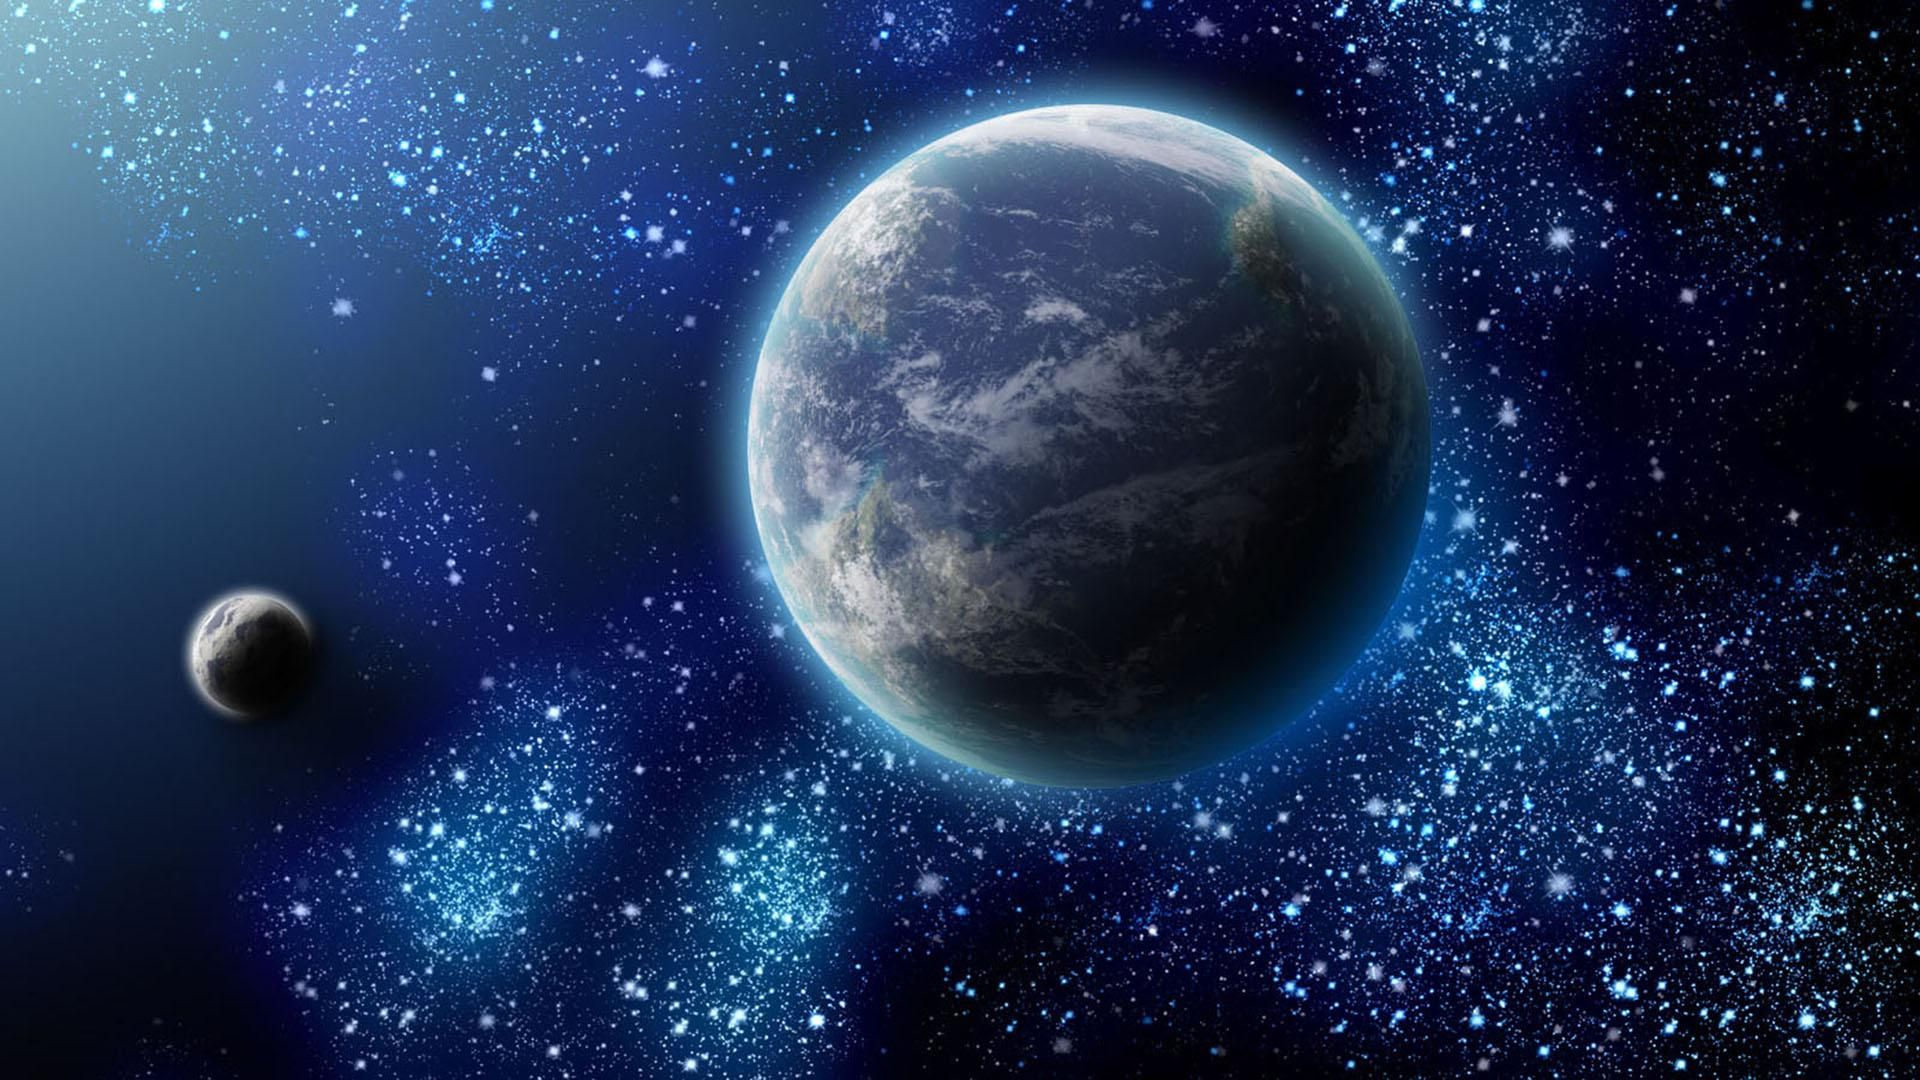 Hd wallpaper universe - Download Download Digital Universe Wide Hd Wallpaper 9vnav For